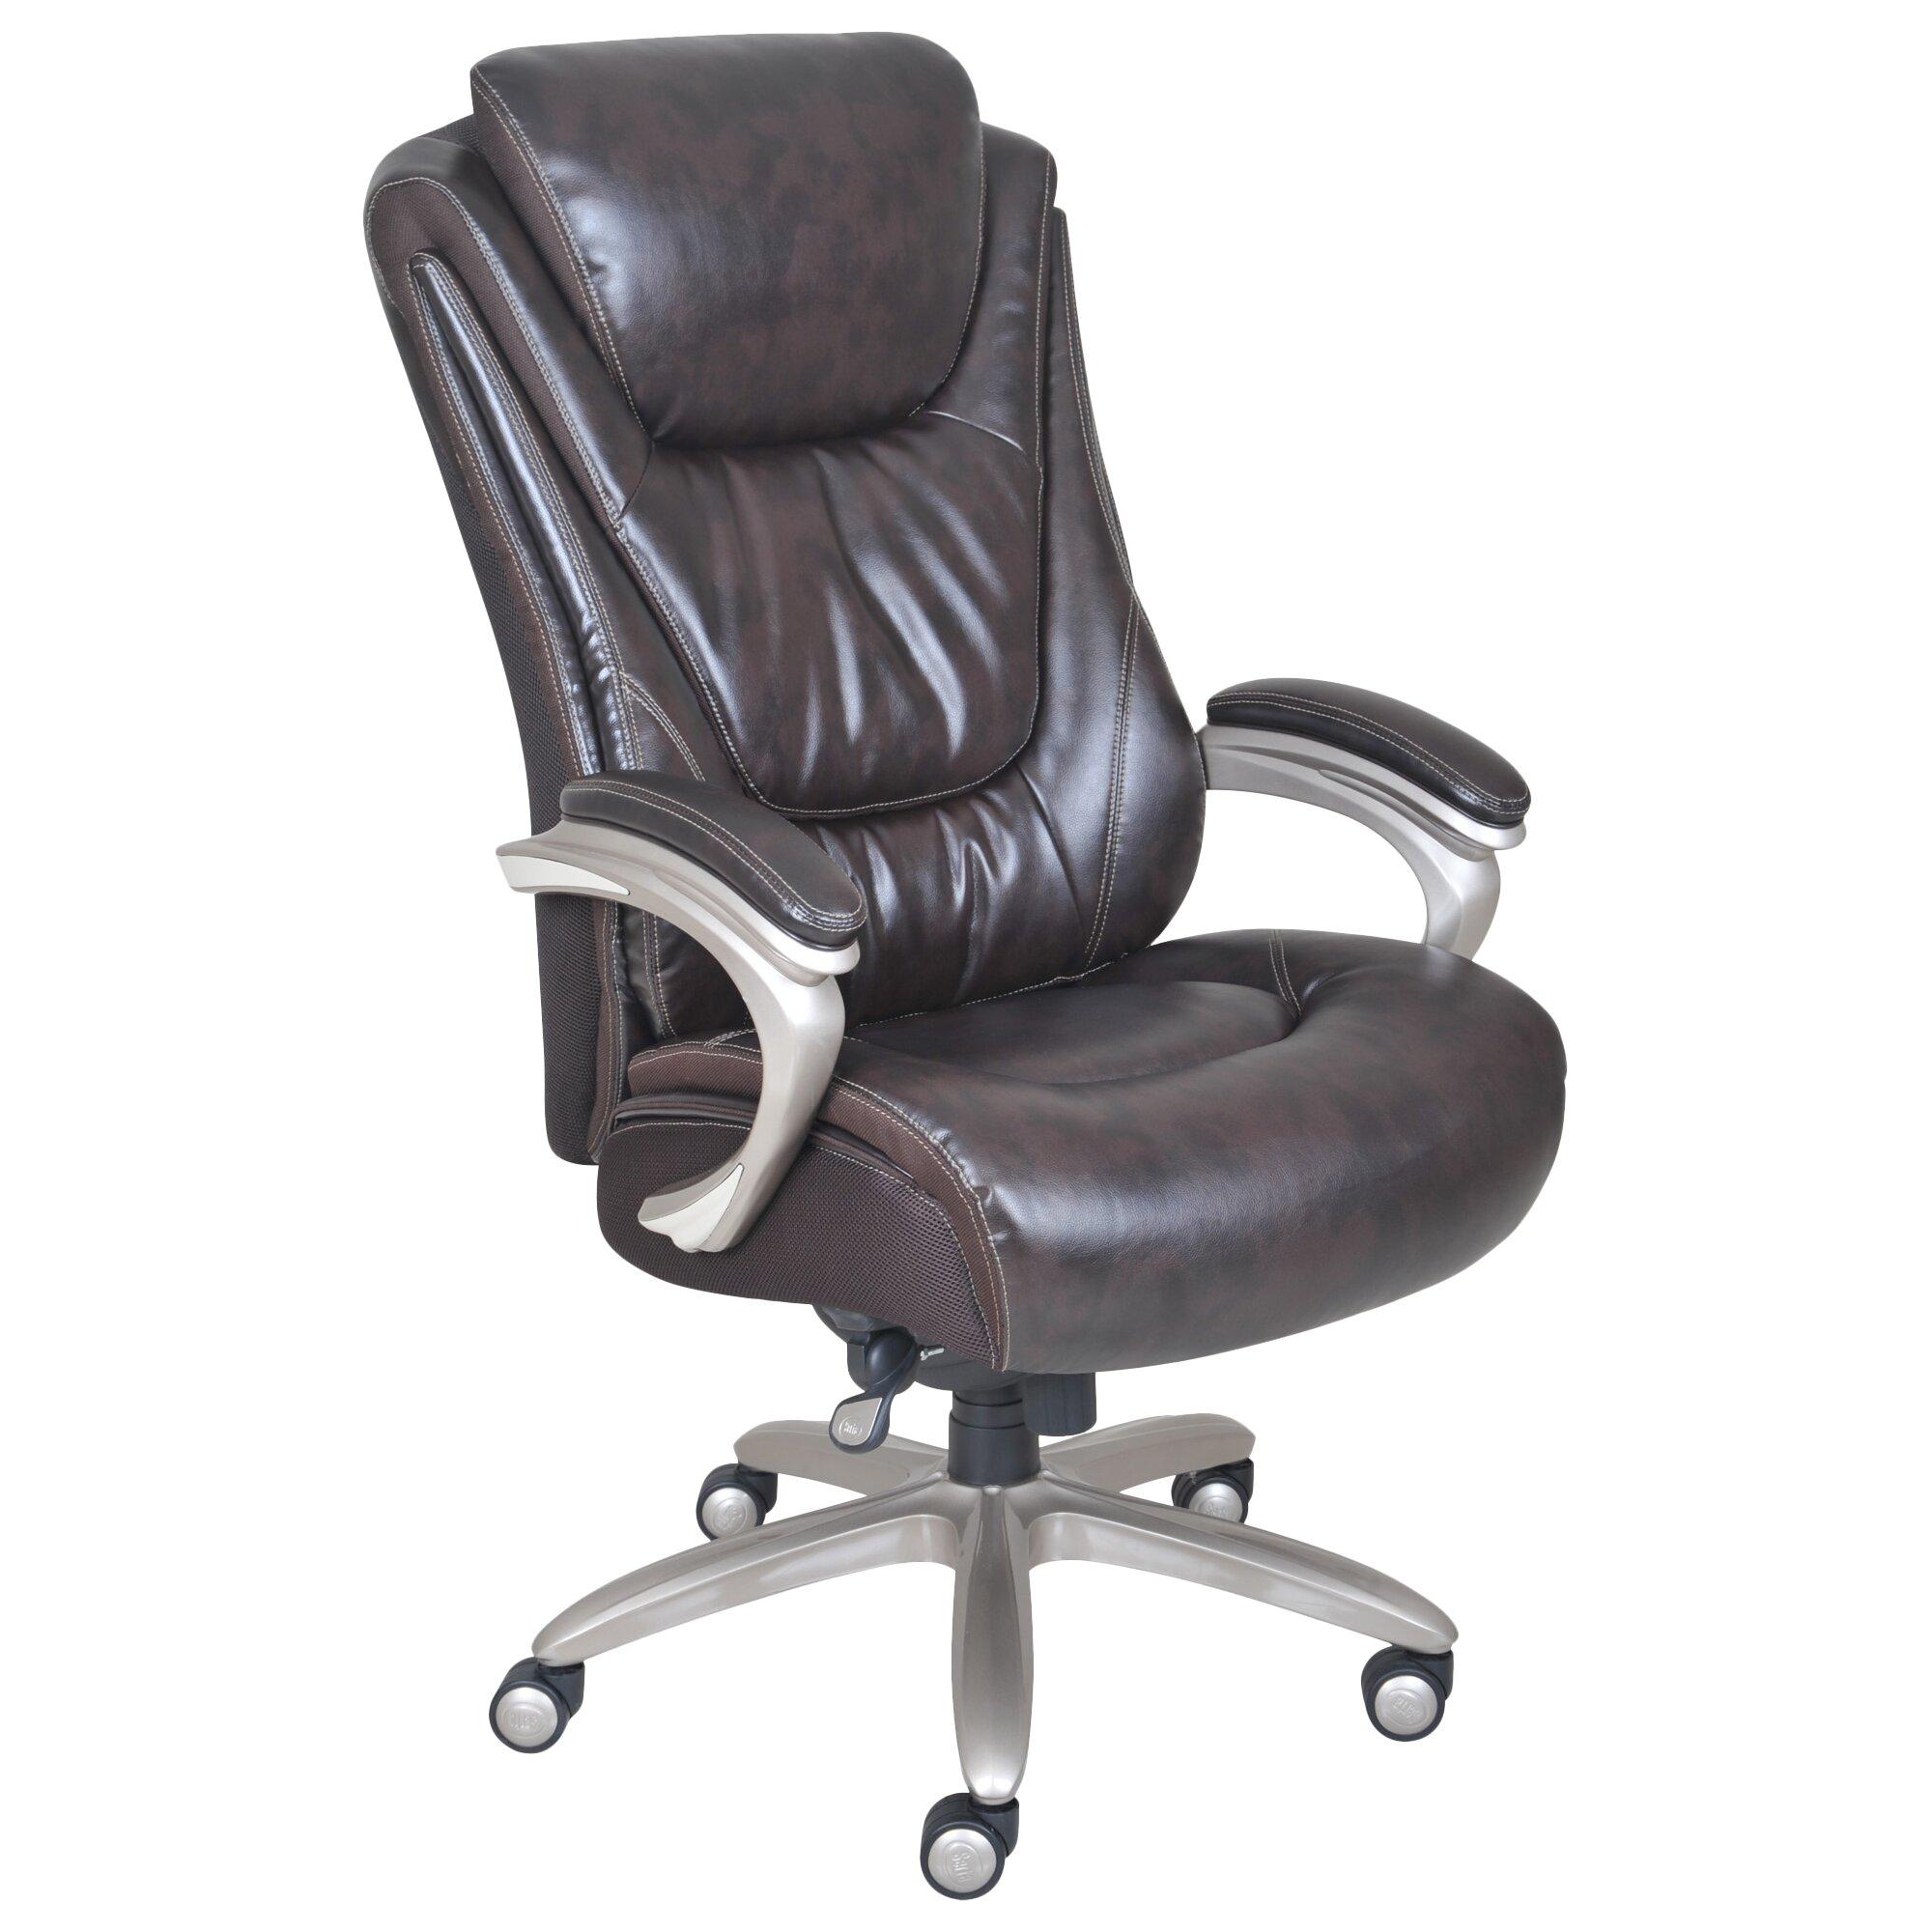 Serta At Home Blissfully Executive Chair Reviews Wayfair